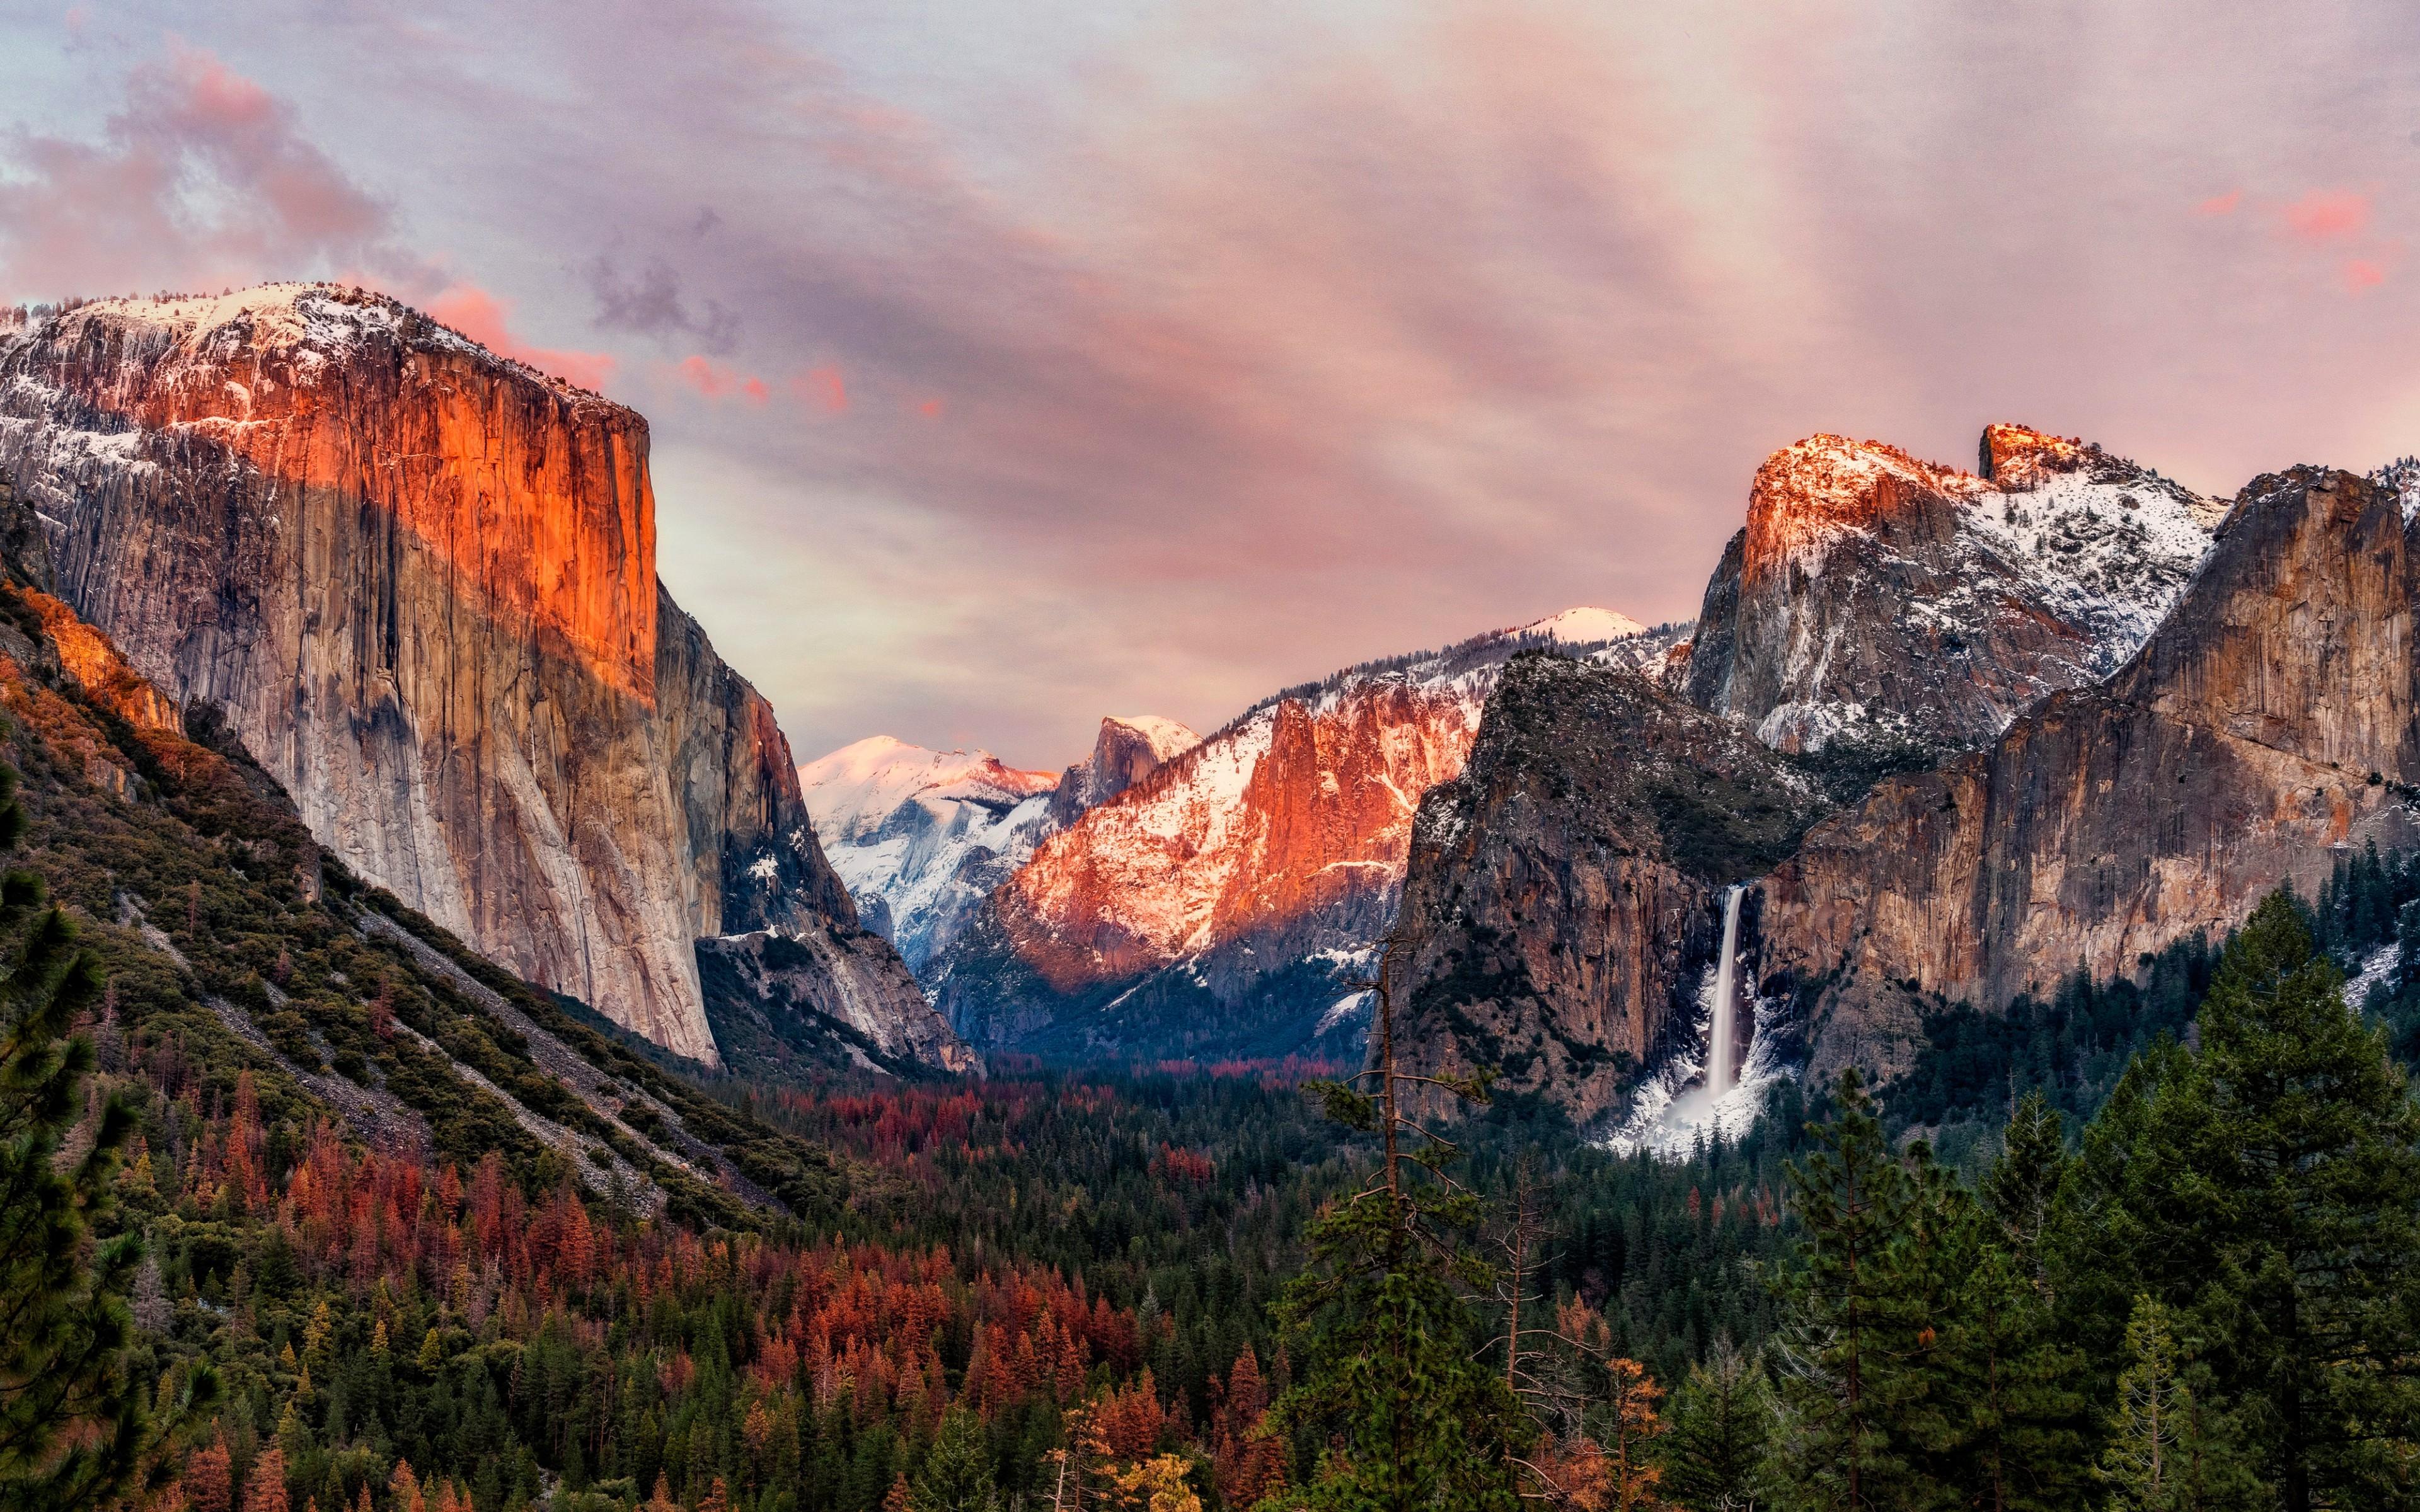 Latest Wallpaper Hd 3d El Capitan Yosemite Valley 4k Wallpapers Hd Wallpapers